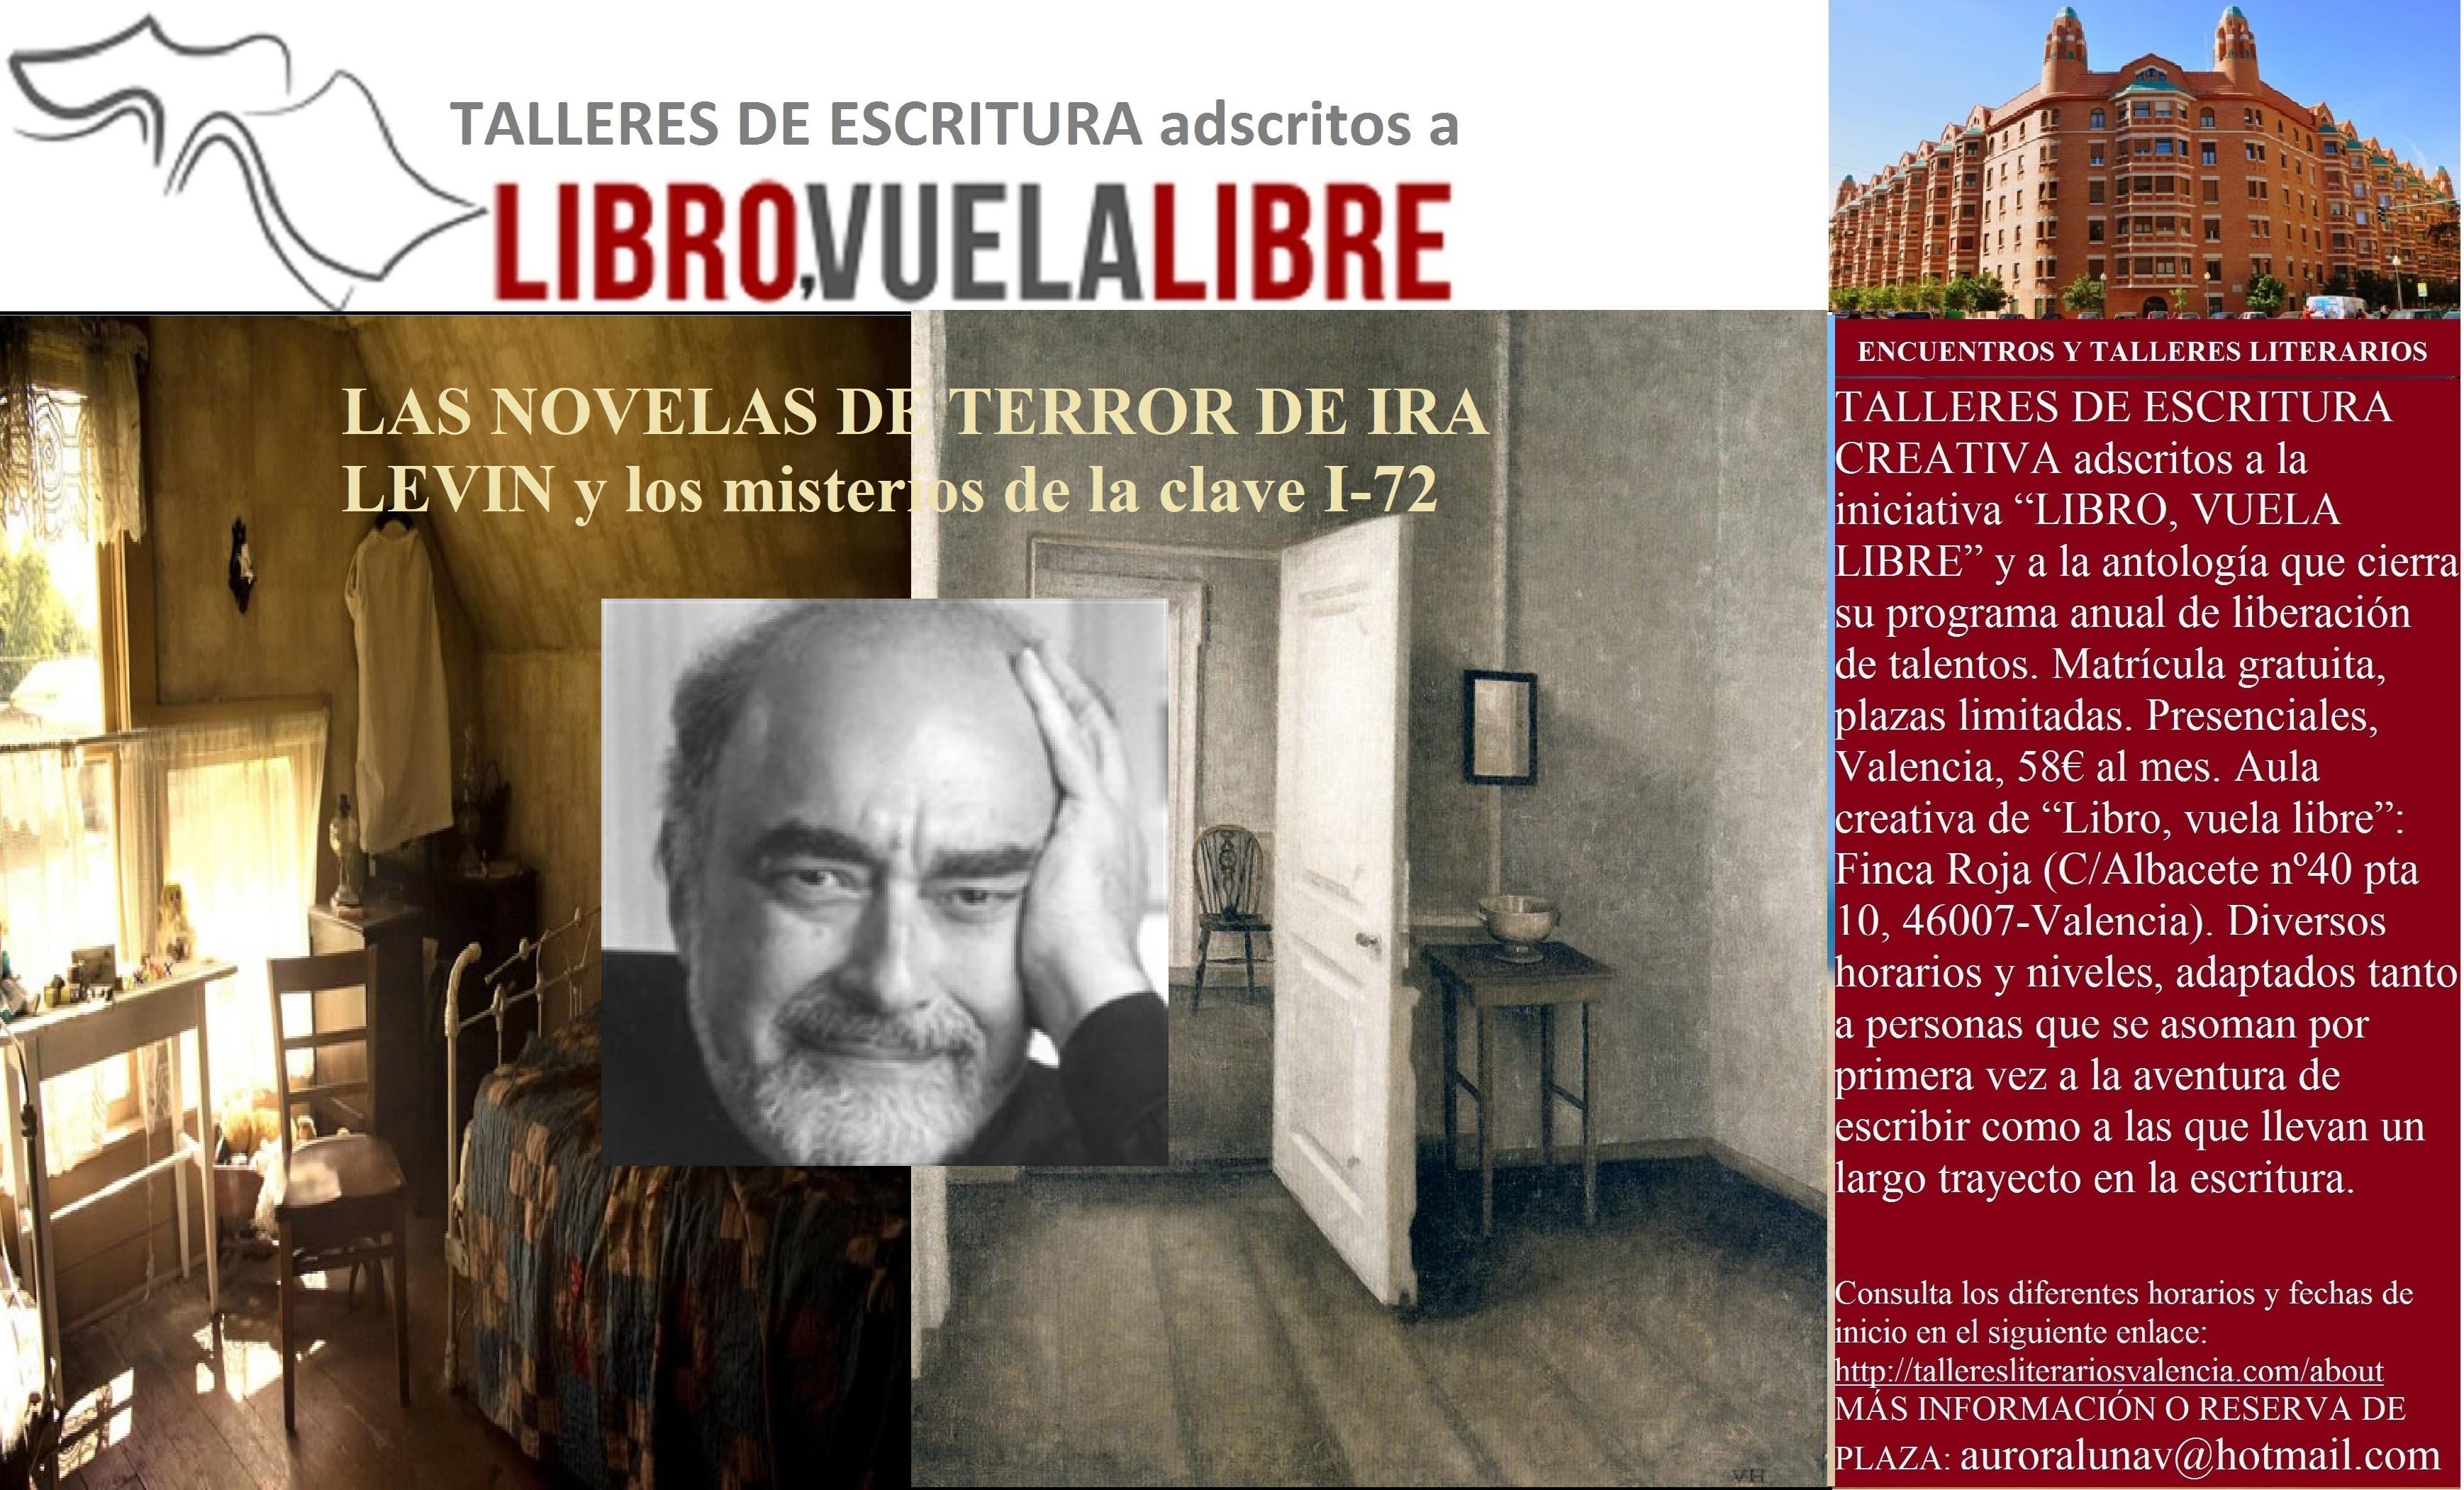 LAS NOVELAS DE TERROR DE IRA LEVIN. Talleres de escritura creativa en Valencia, clave I-72